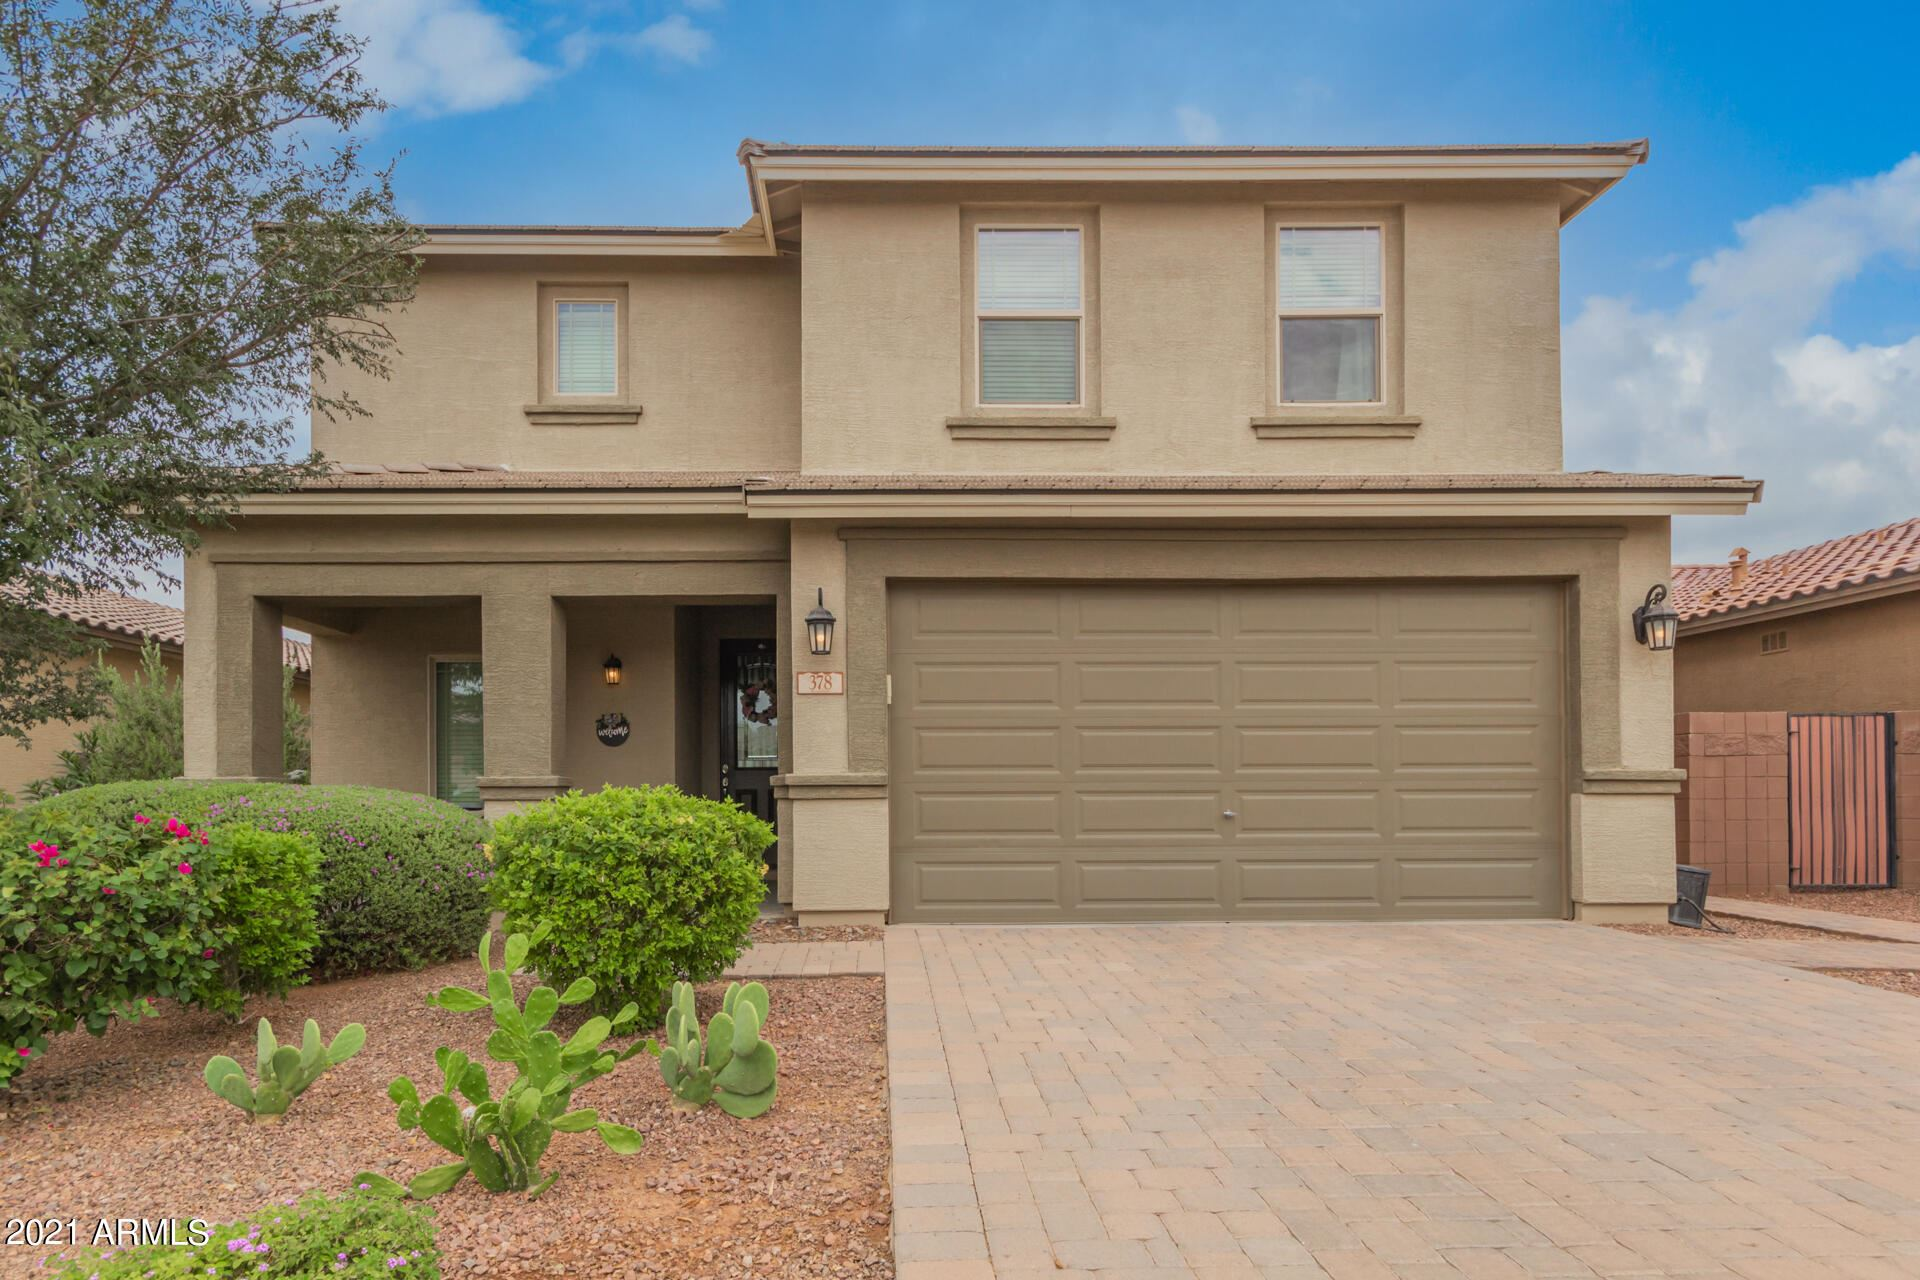 Photo of 378 W EVERGREEN PEAR Avenue, San Tan Valley, AZ 85140 (MLS # 6268309)